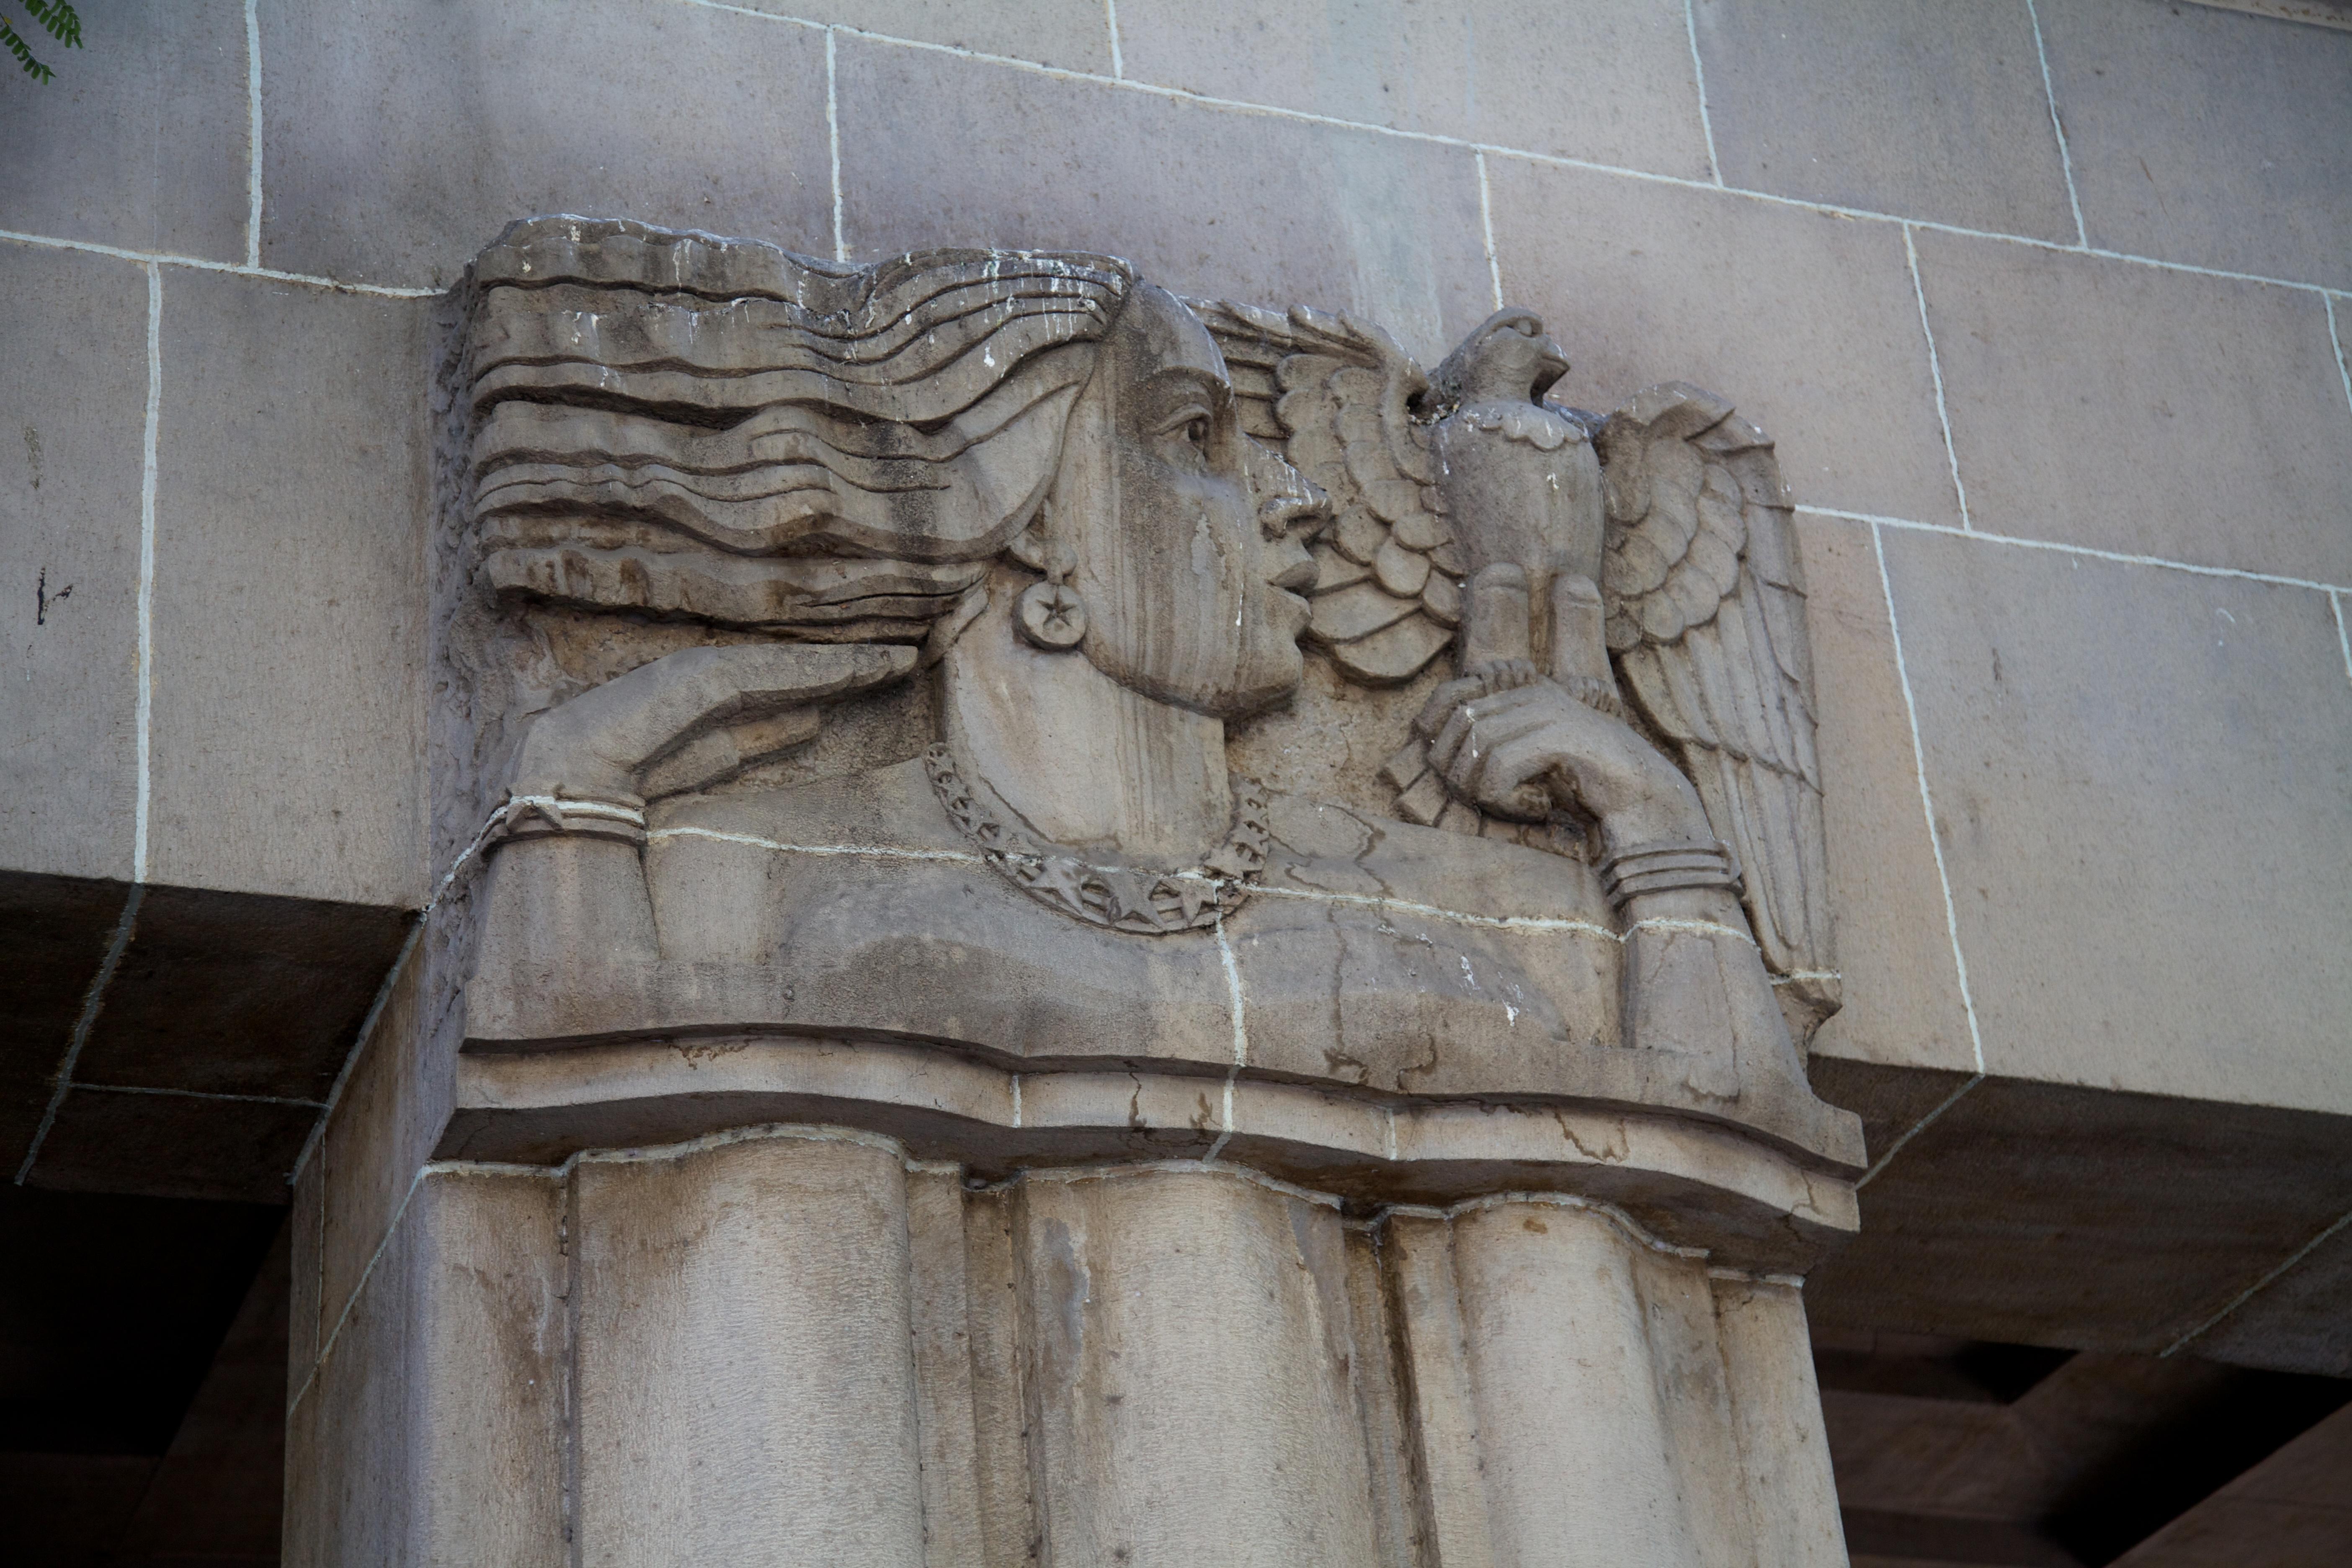 File:Art Deco Bas Relief (14414520684).jpg - Wikimedia Commons